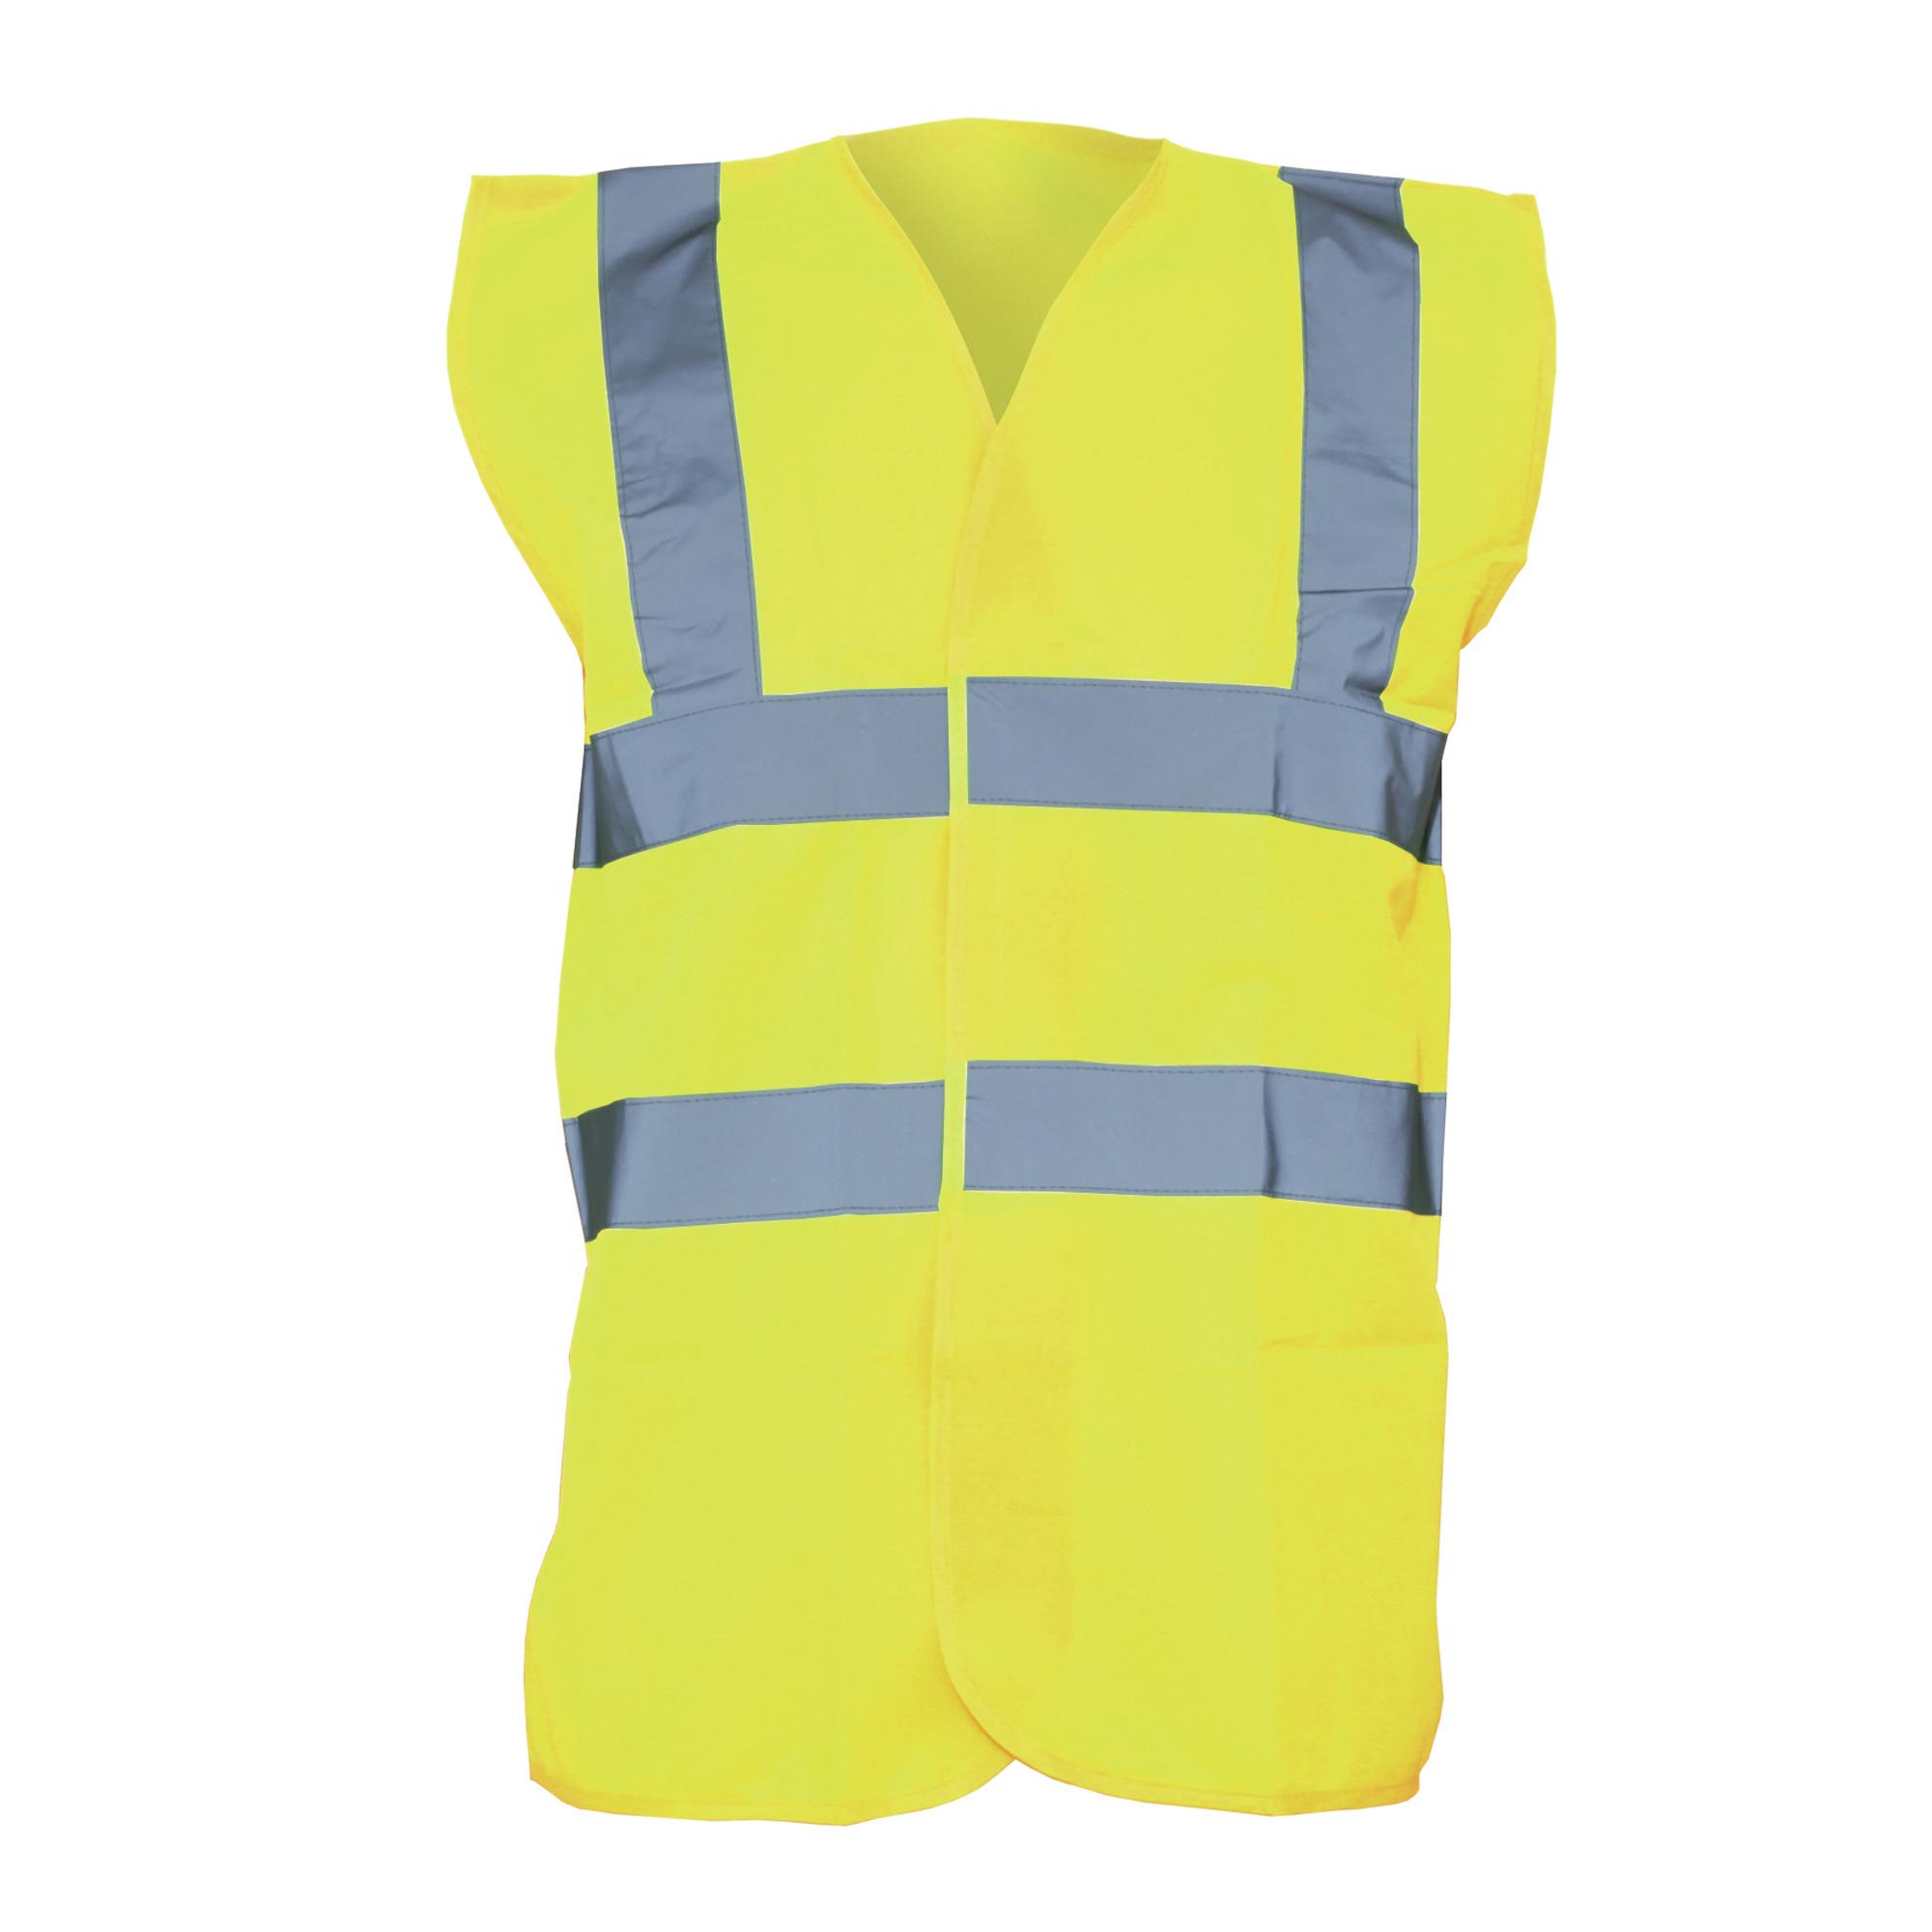 Yoko Unisex Premium Hi-Vis Waistcoat Vest / Jacket (Pack of 2) (4XL) (Hi-Vis Yellow)